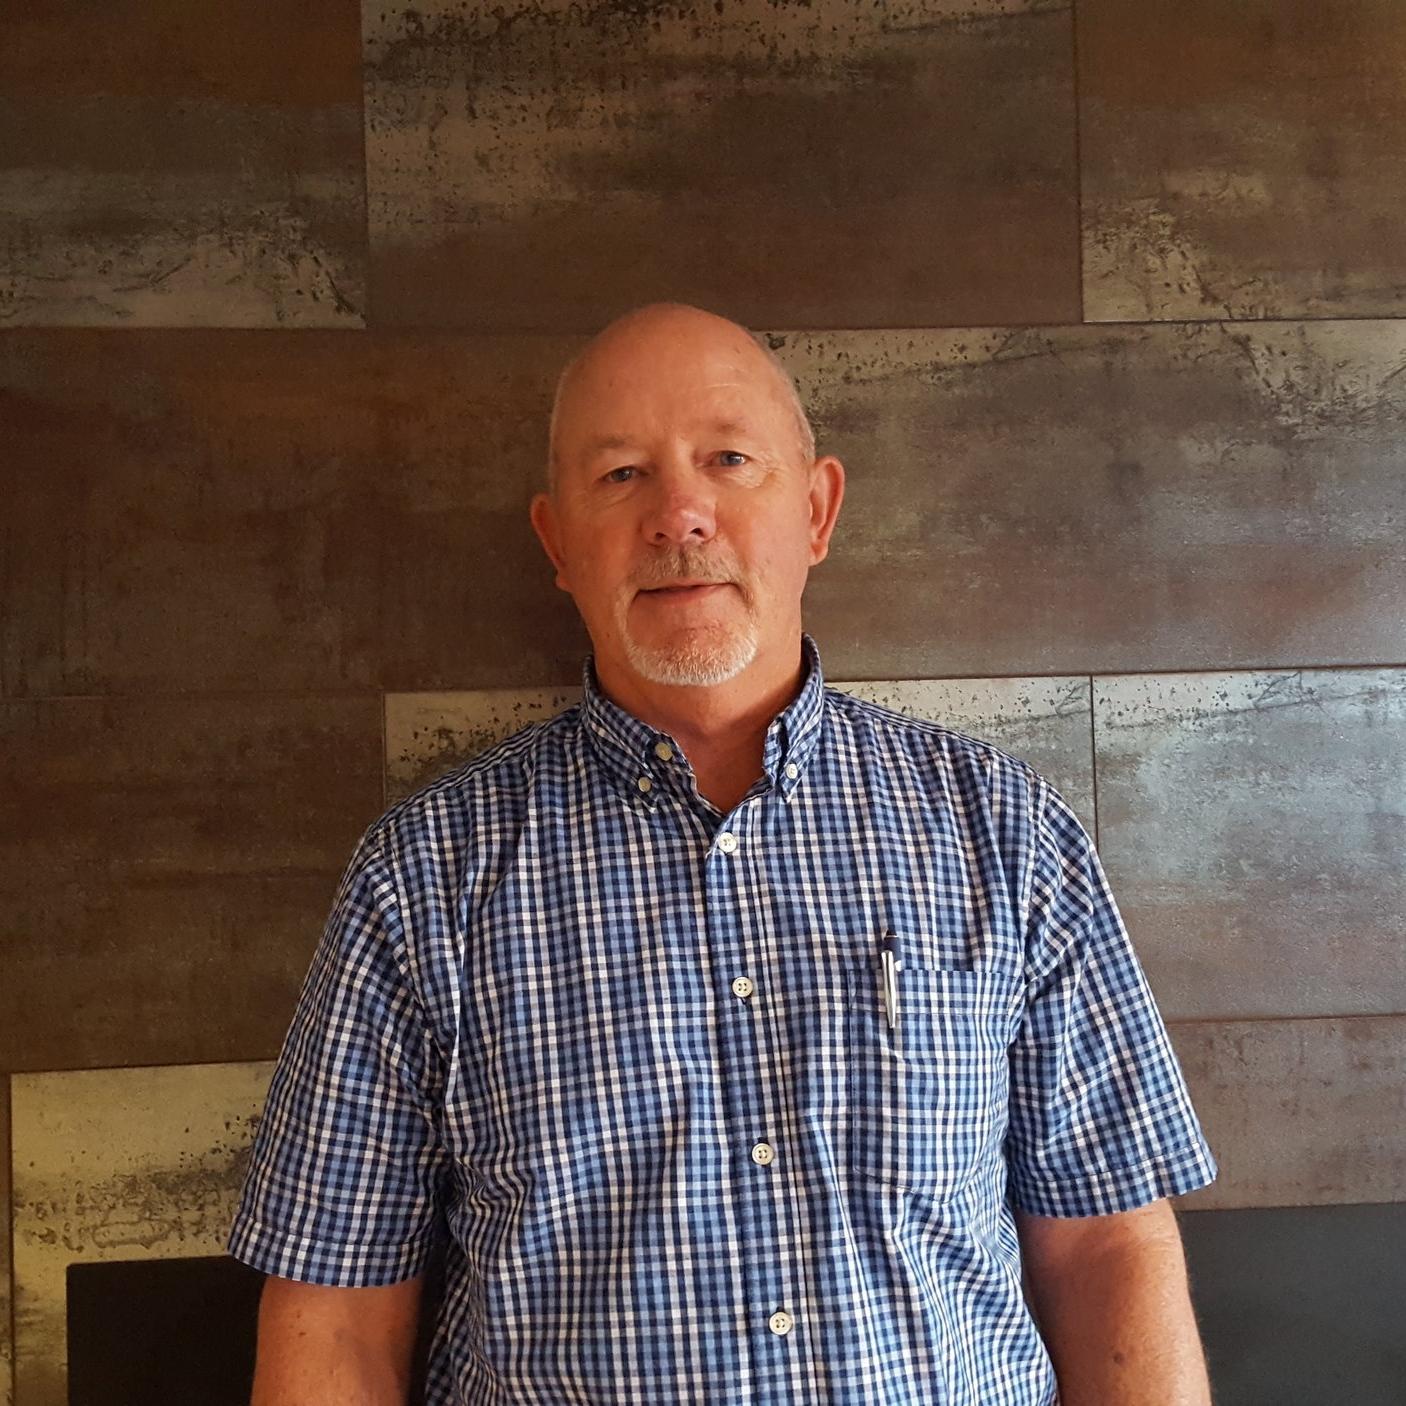 Steve Carroll, Vice President / Superintendent